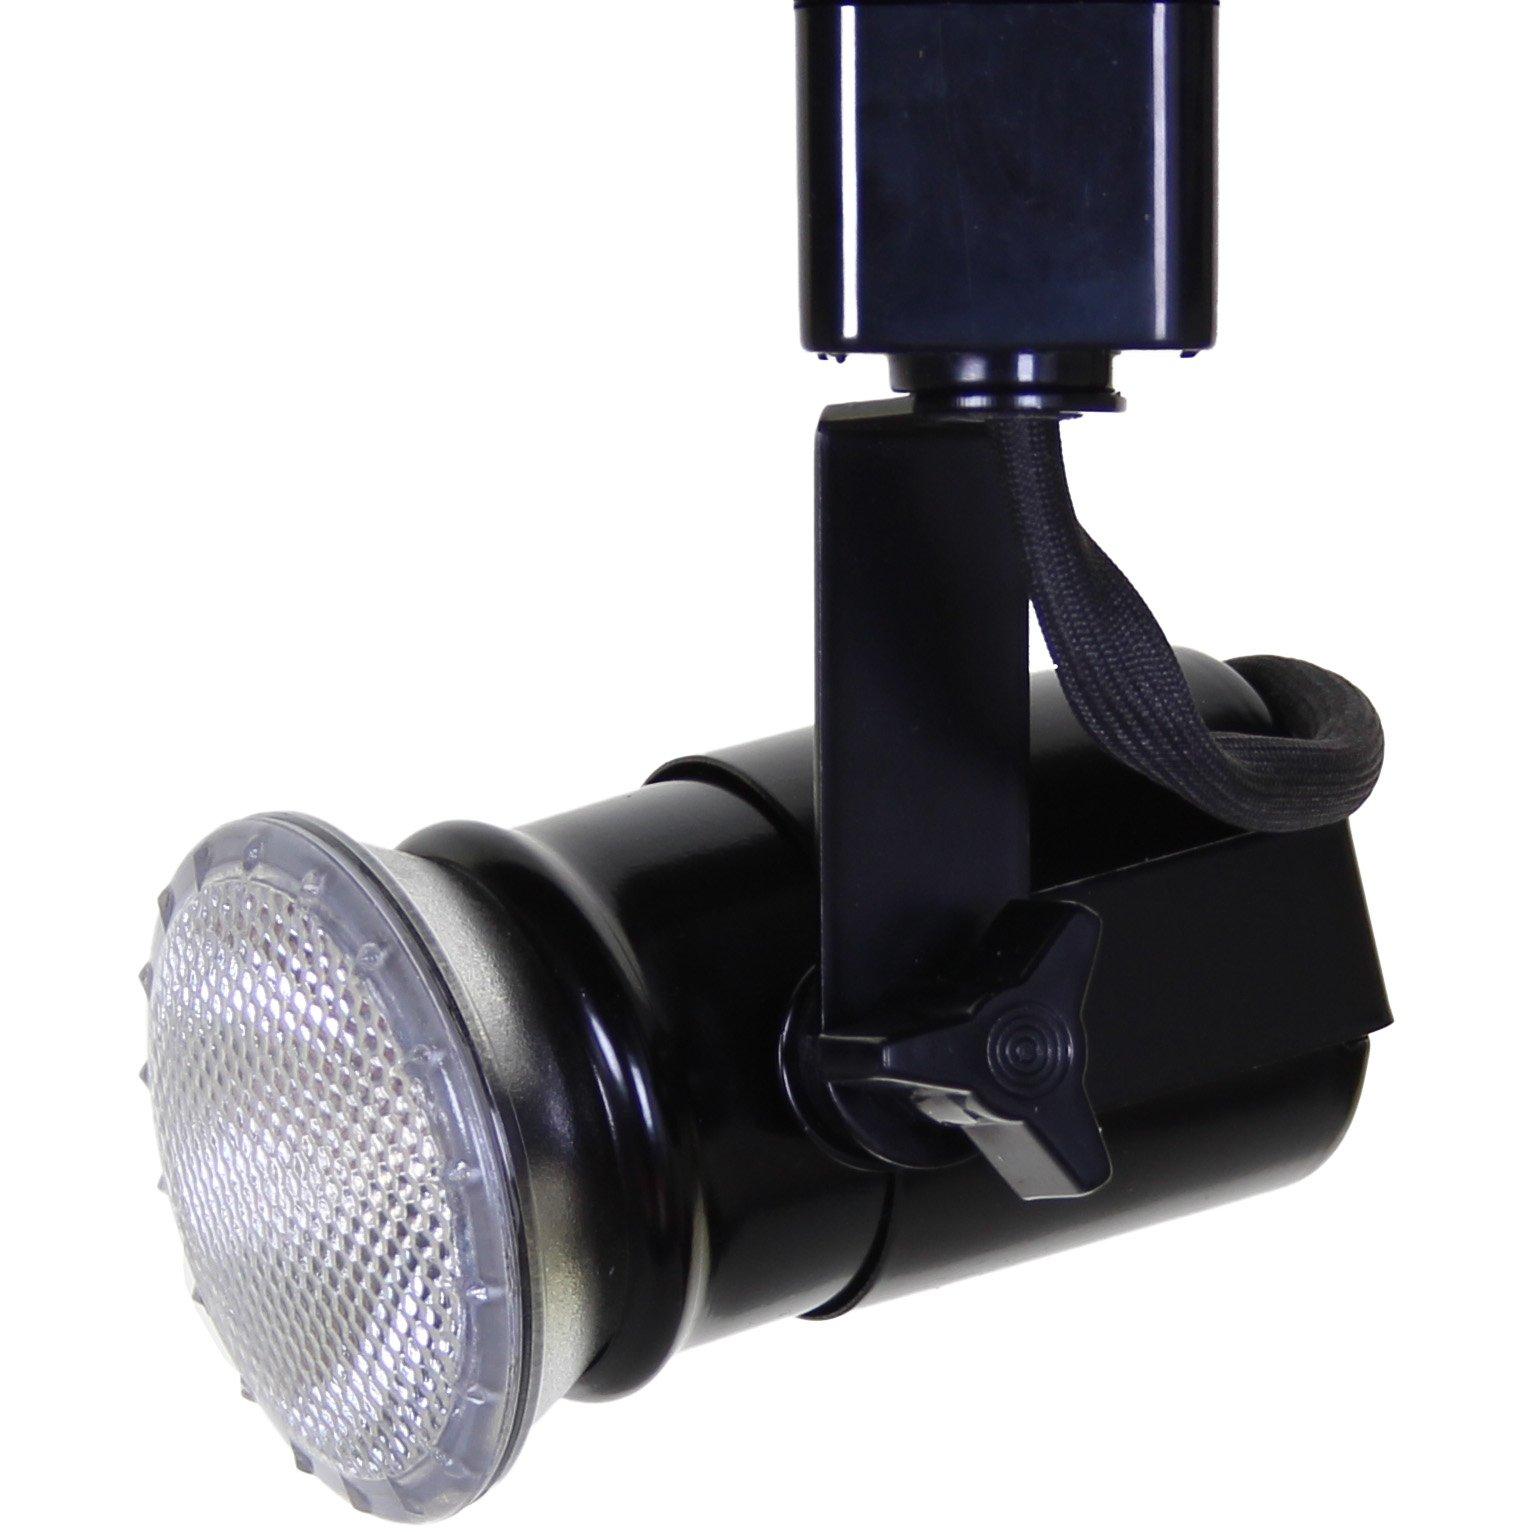 Direct-Lighting 50047 Black Universal Line Voltage Track Lighting Head